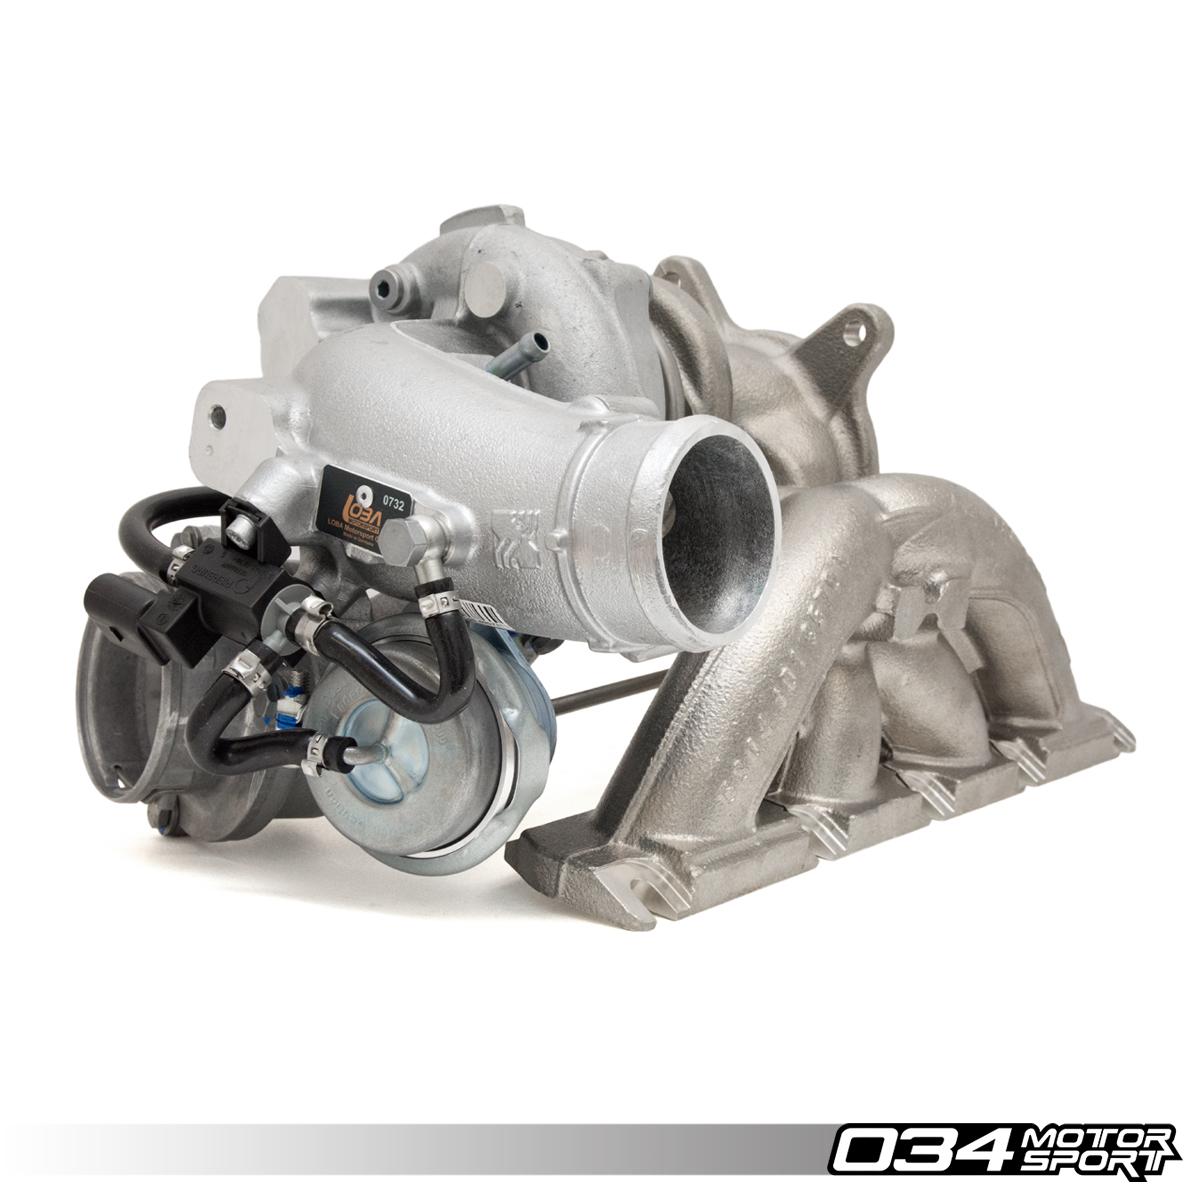 turbo golf fsi kit upgrade volkswagen 0t tuning r420 mkvi 034motorsport package vw 1016 audi hre flowform wheels cart store